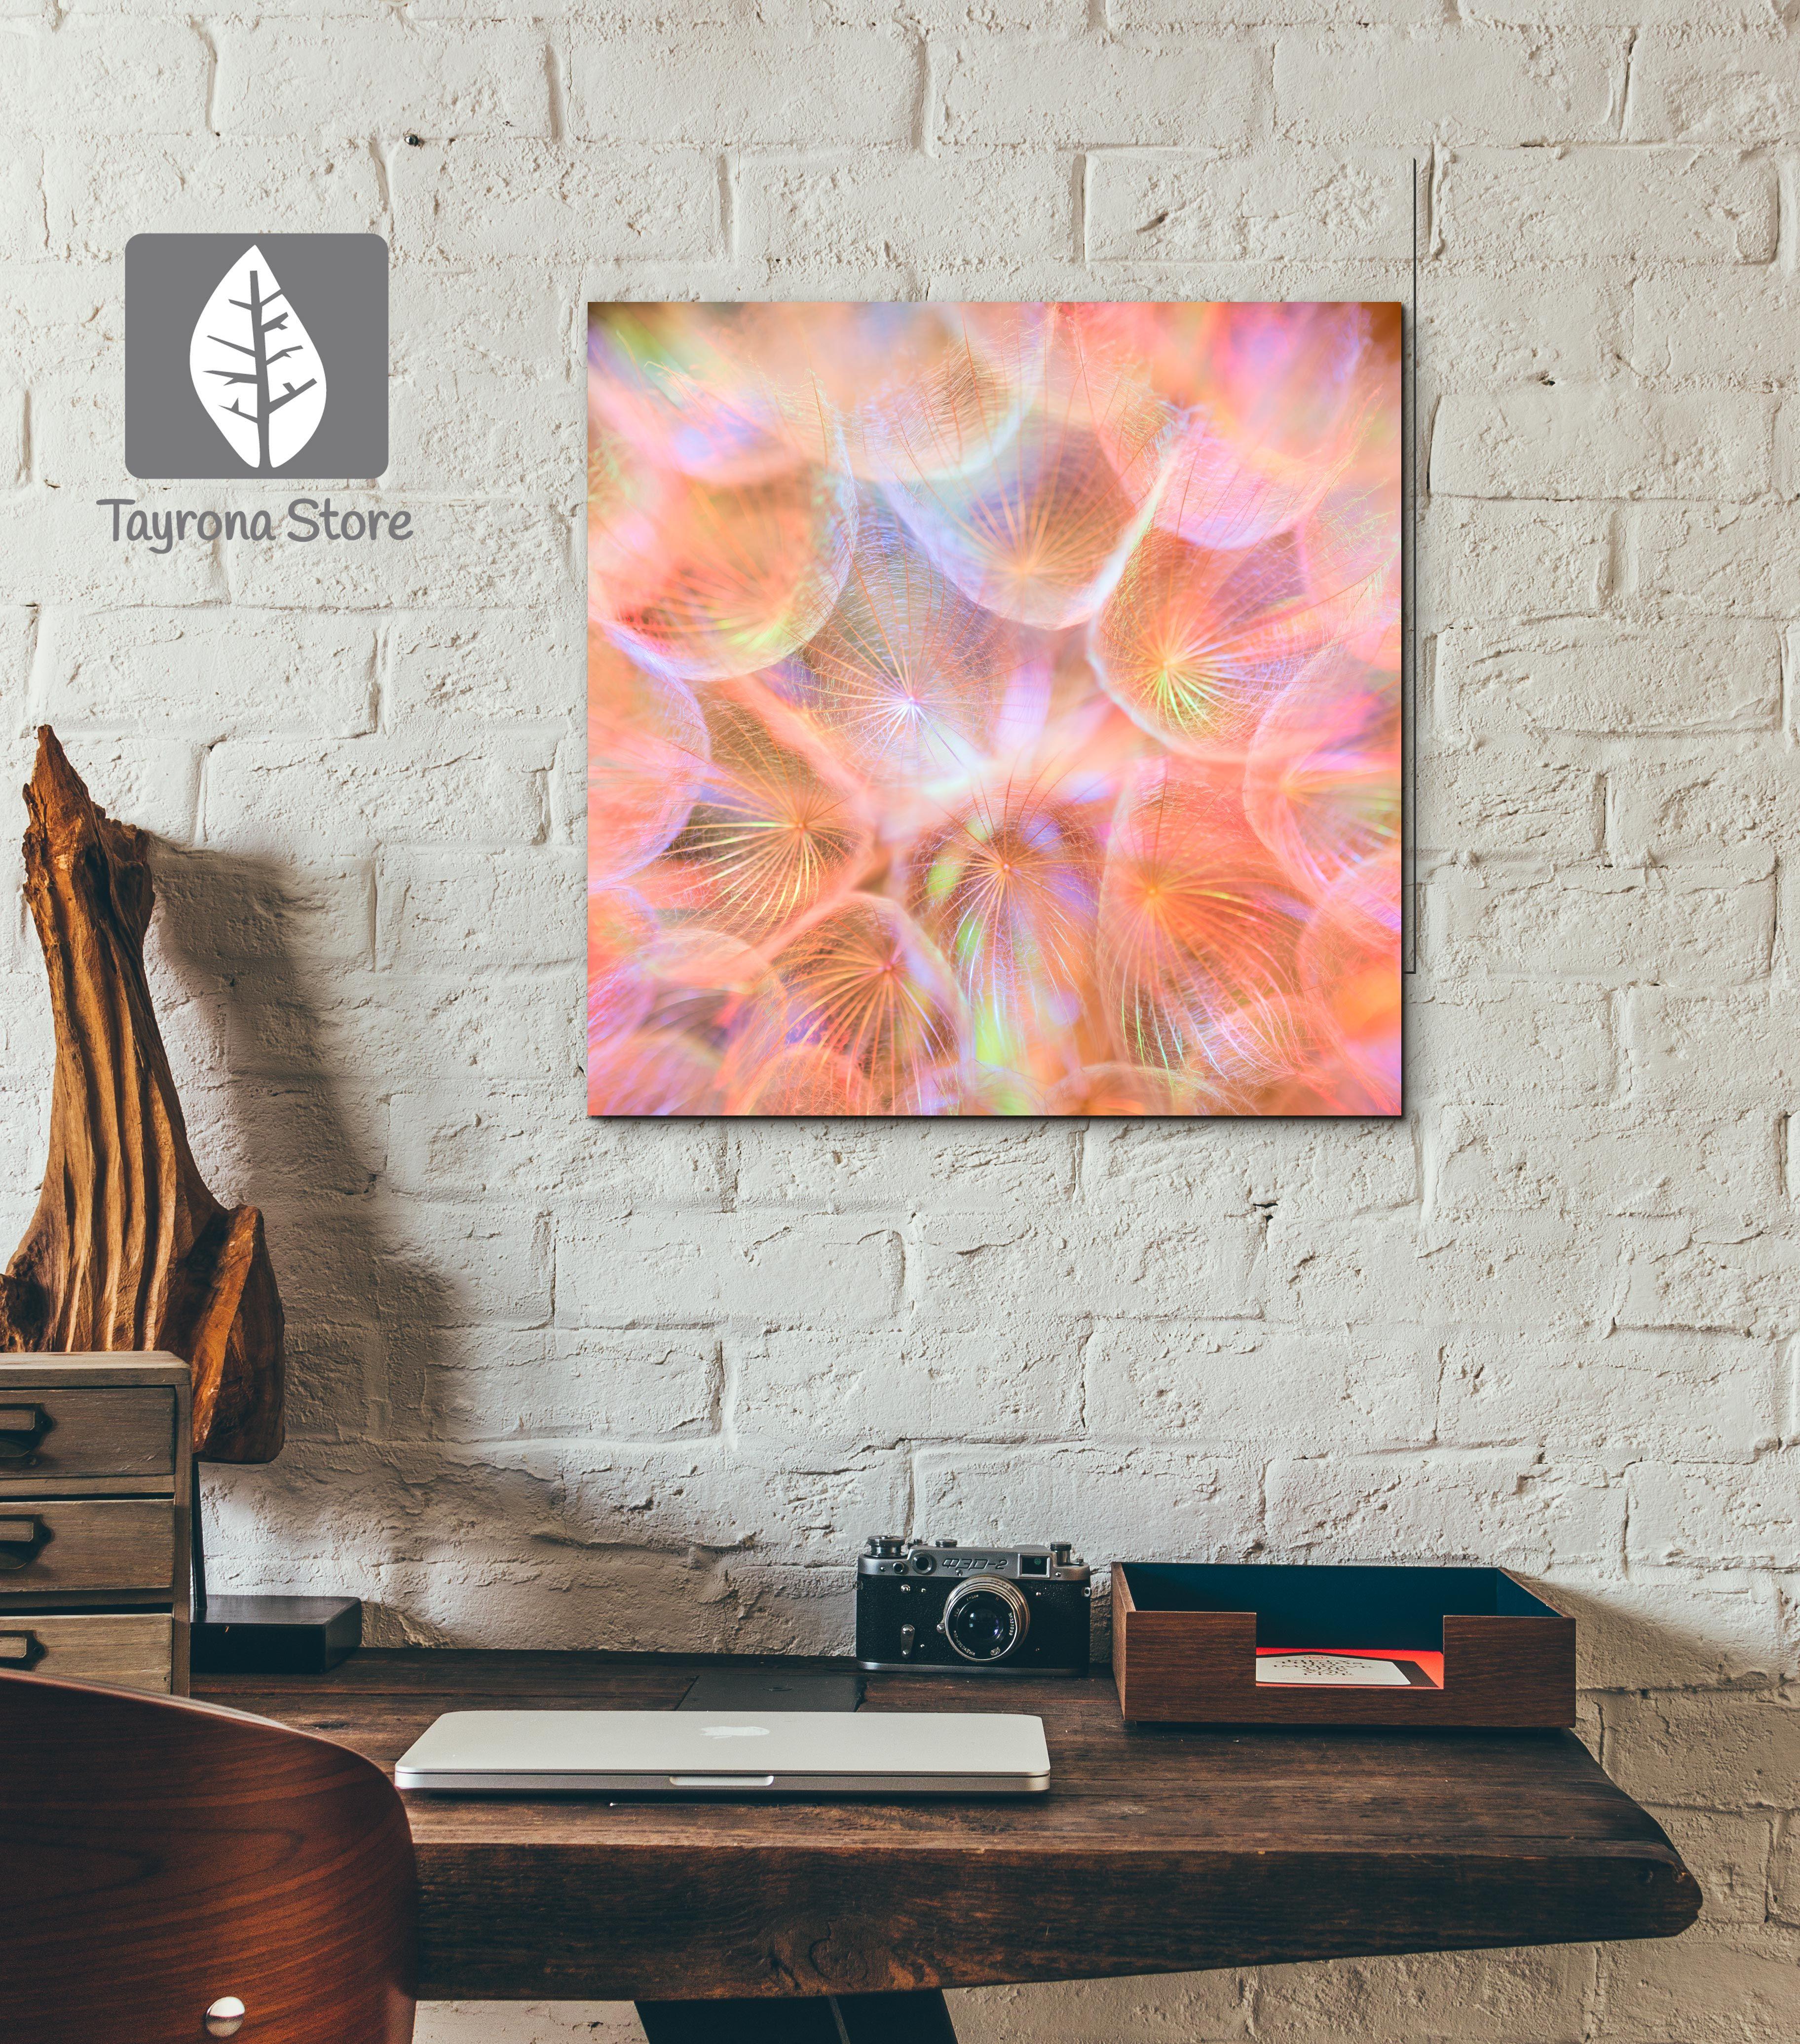 Cuadros Decorativos Mandala-flor-152 #tayronastore,#cuadros ...